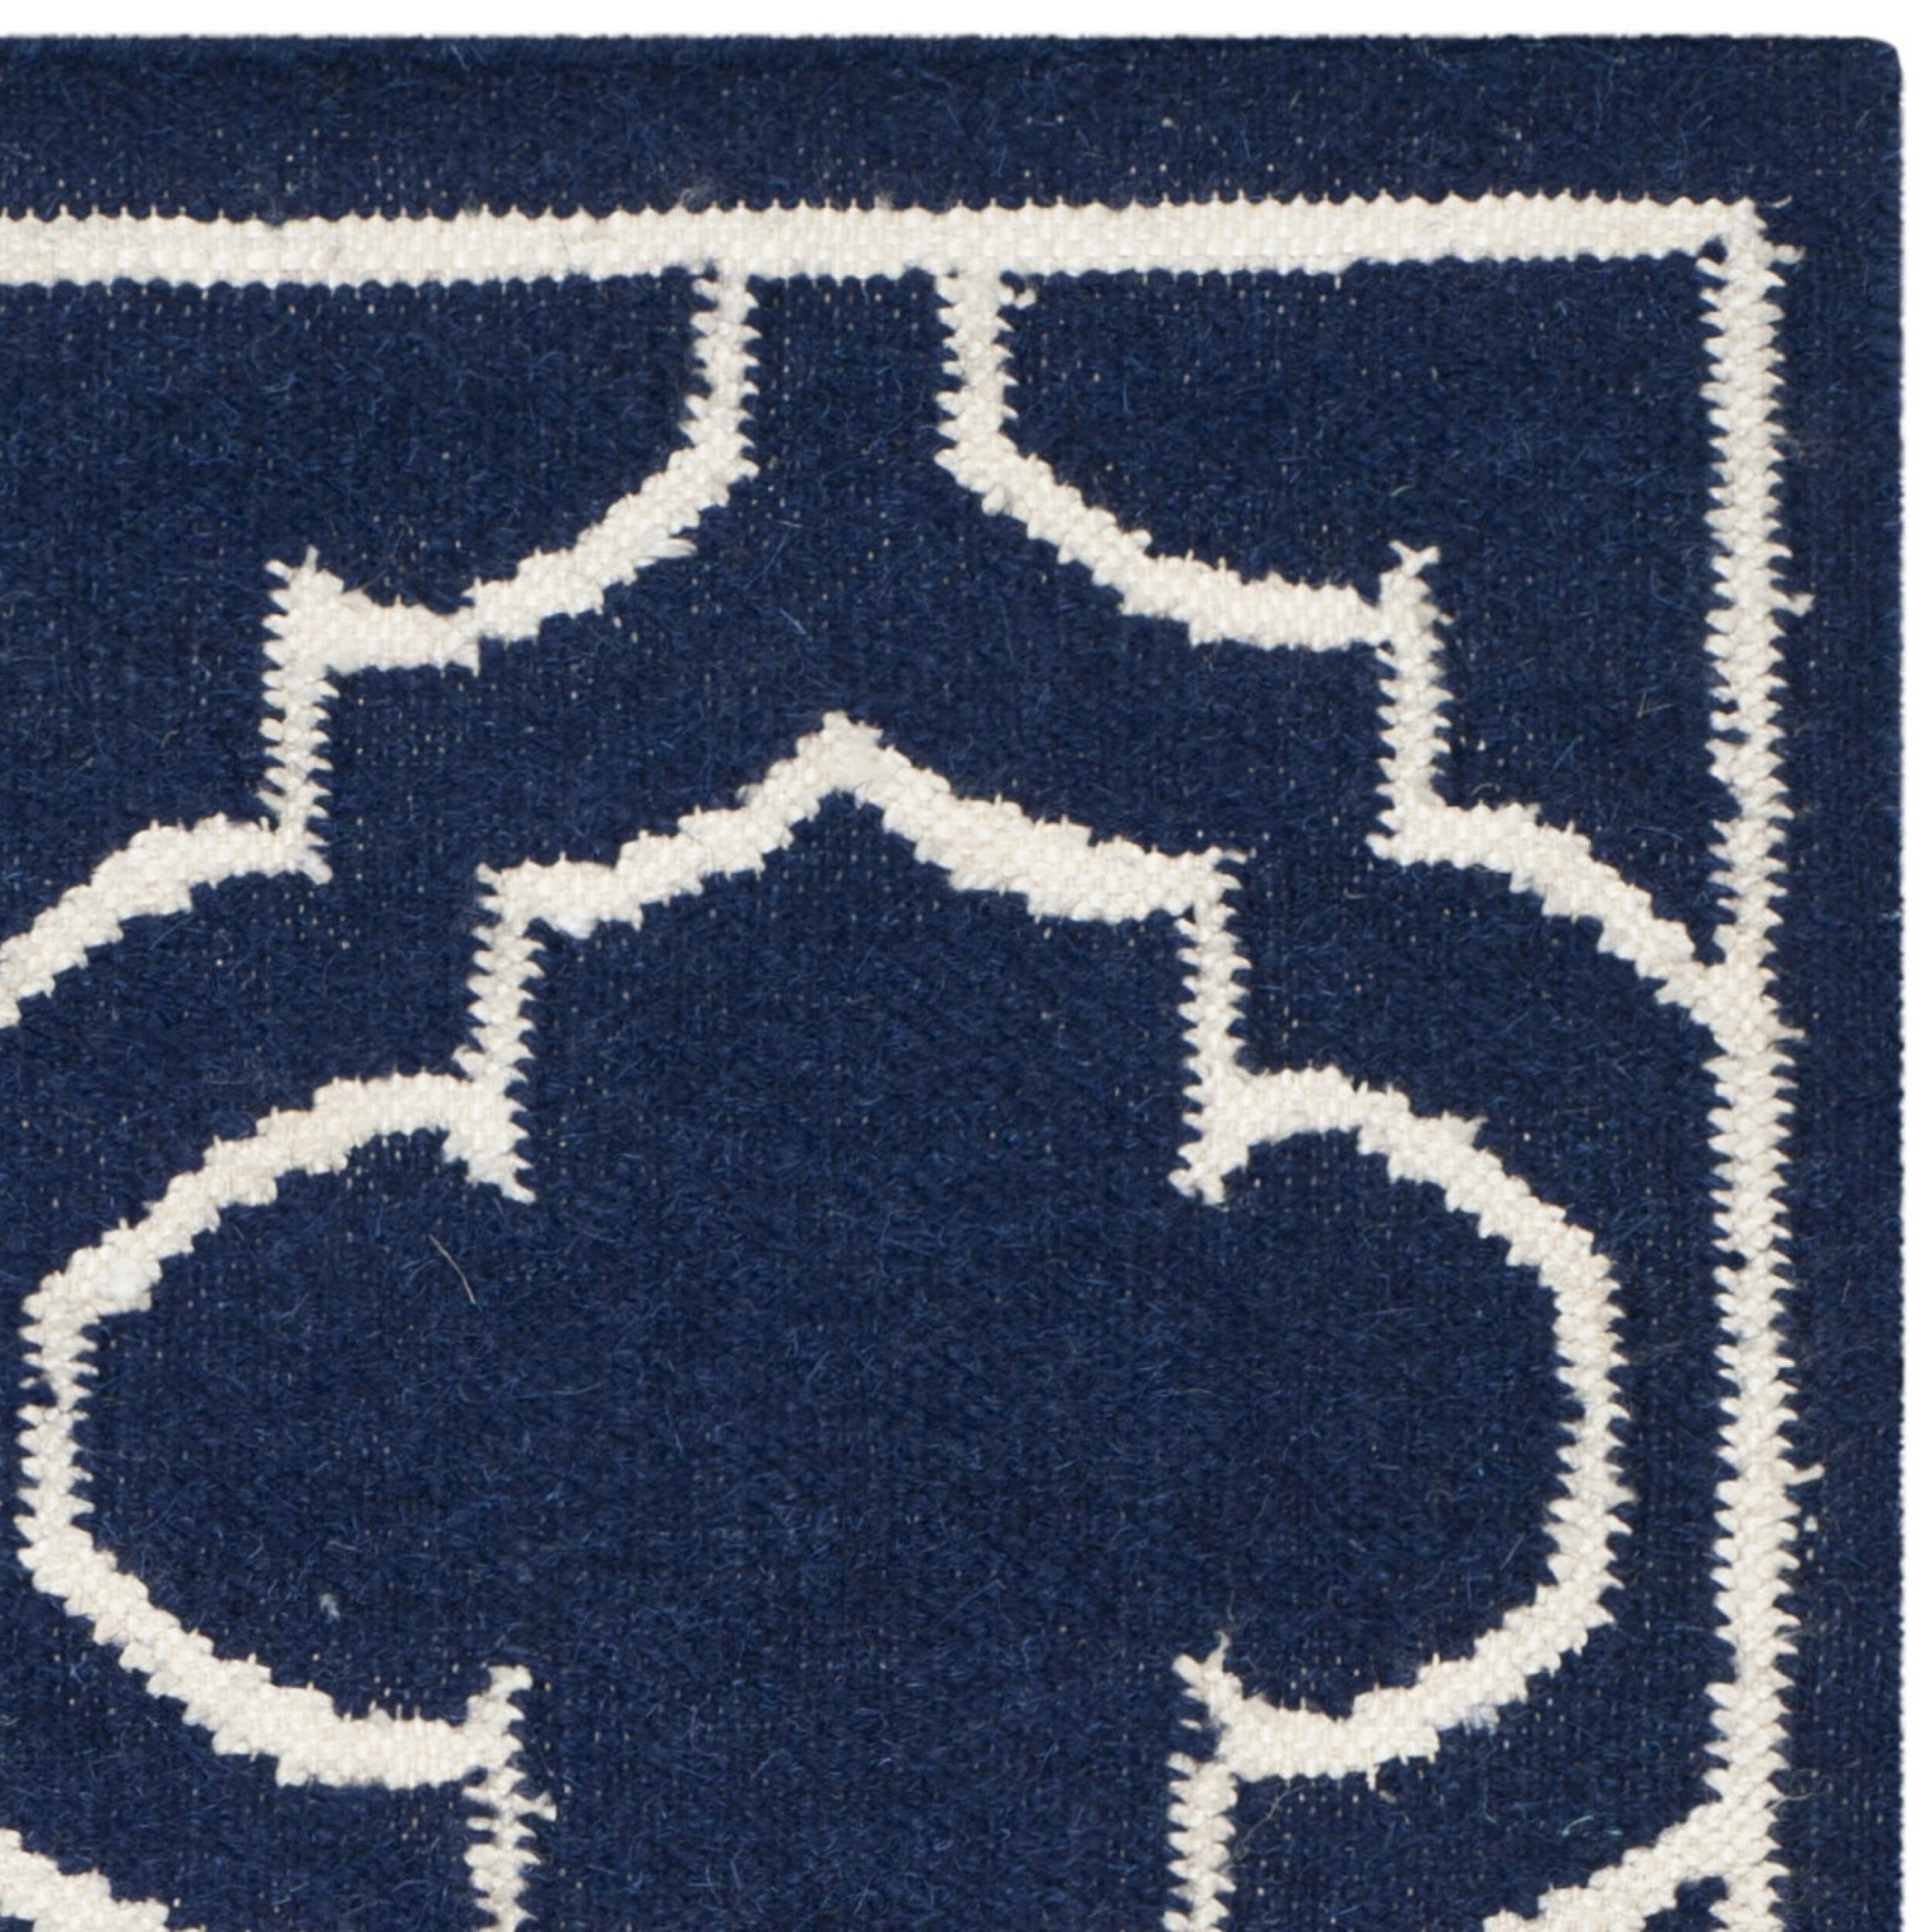 28 safavieh navy rug safavieh milan shag navy blue area rug